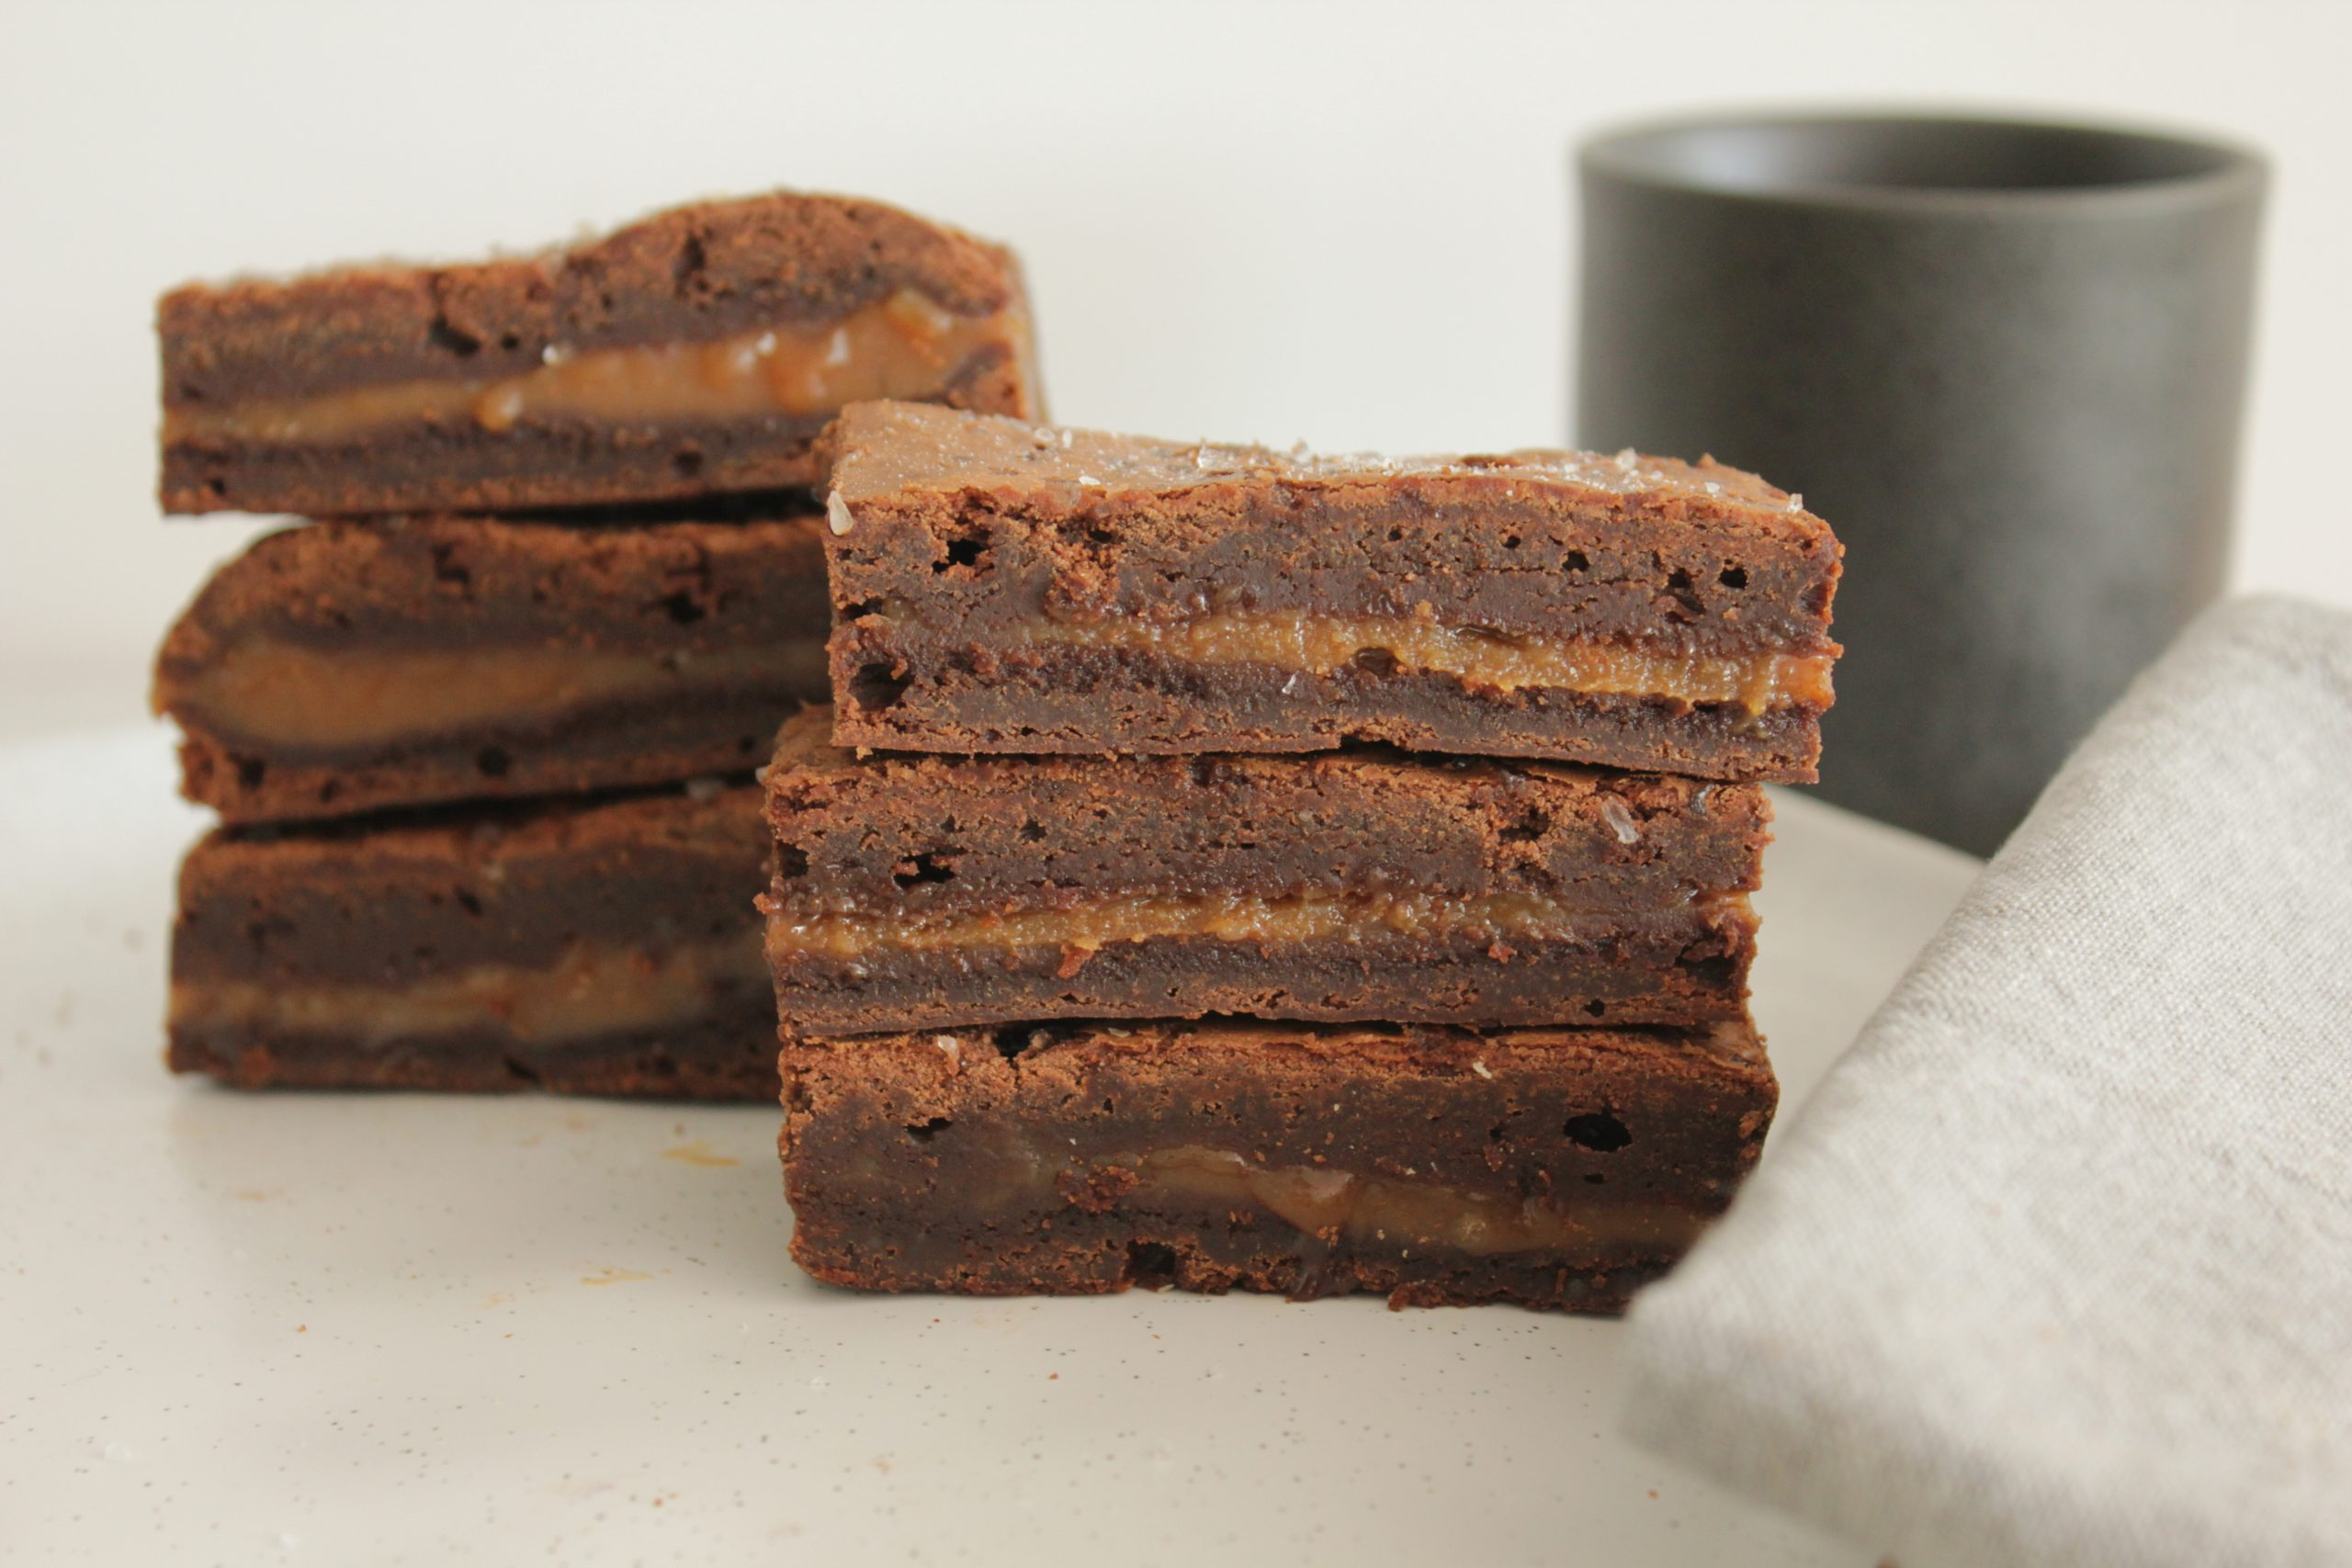 Browniehuys - Salted Caramel